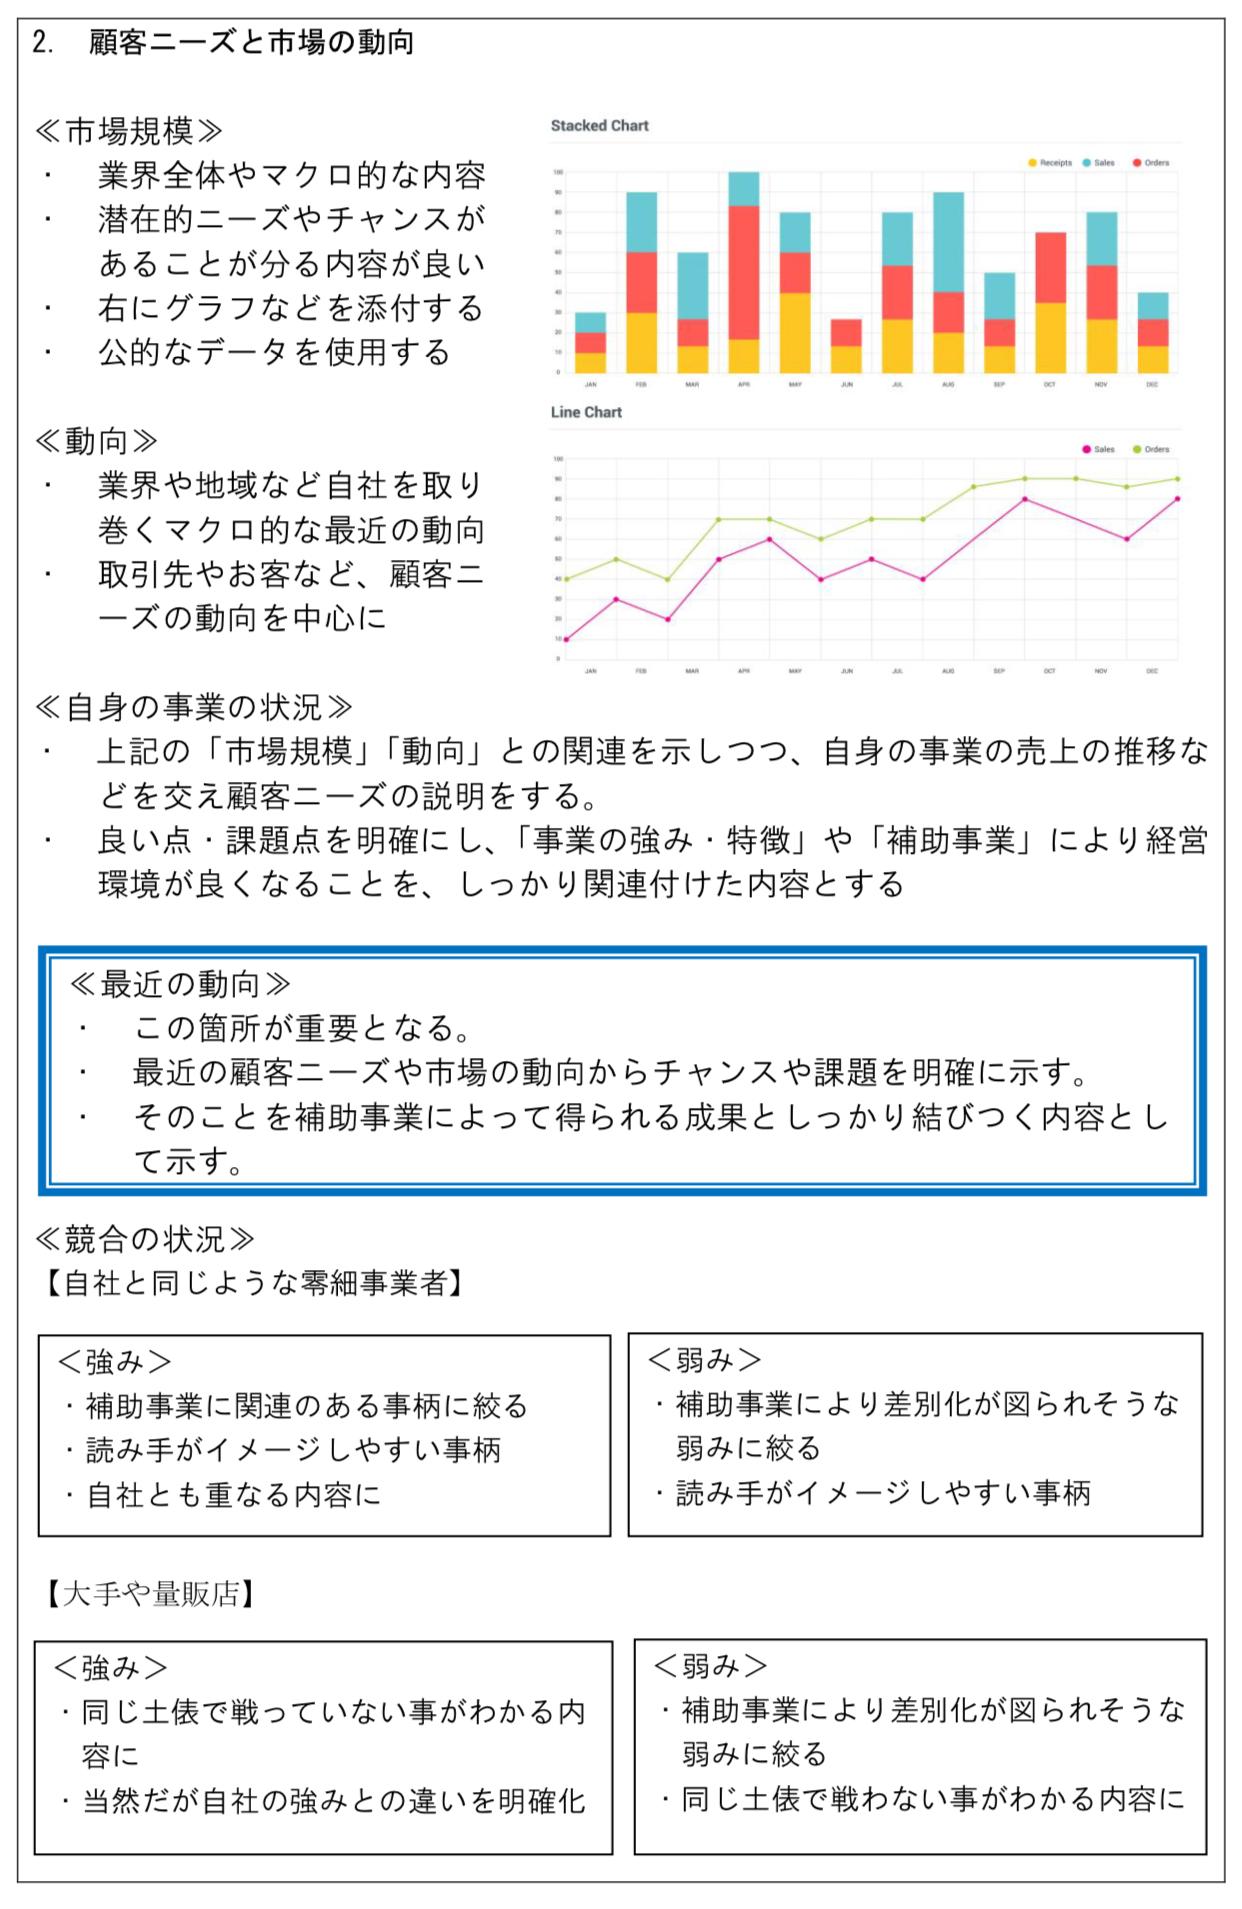 %e7%b5%8c%e5%96%b6%e8%a8%88%e7%94%bb%e6%9b%b8%e3%80%80%ef%bc%92